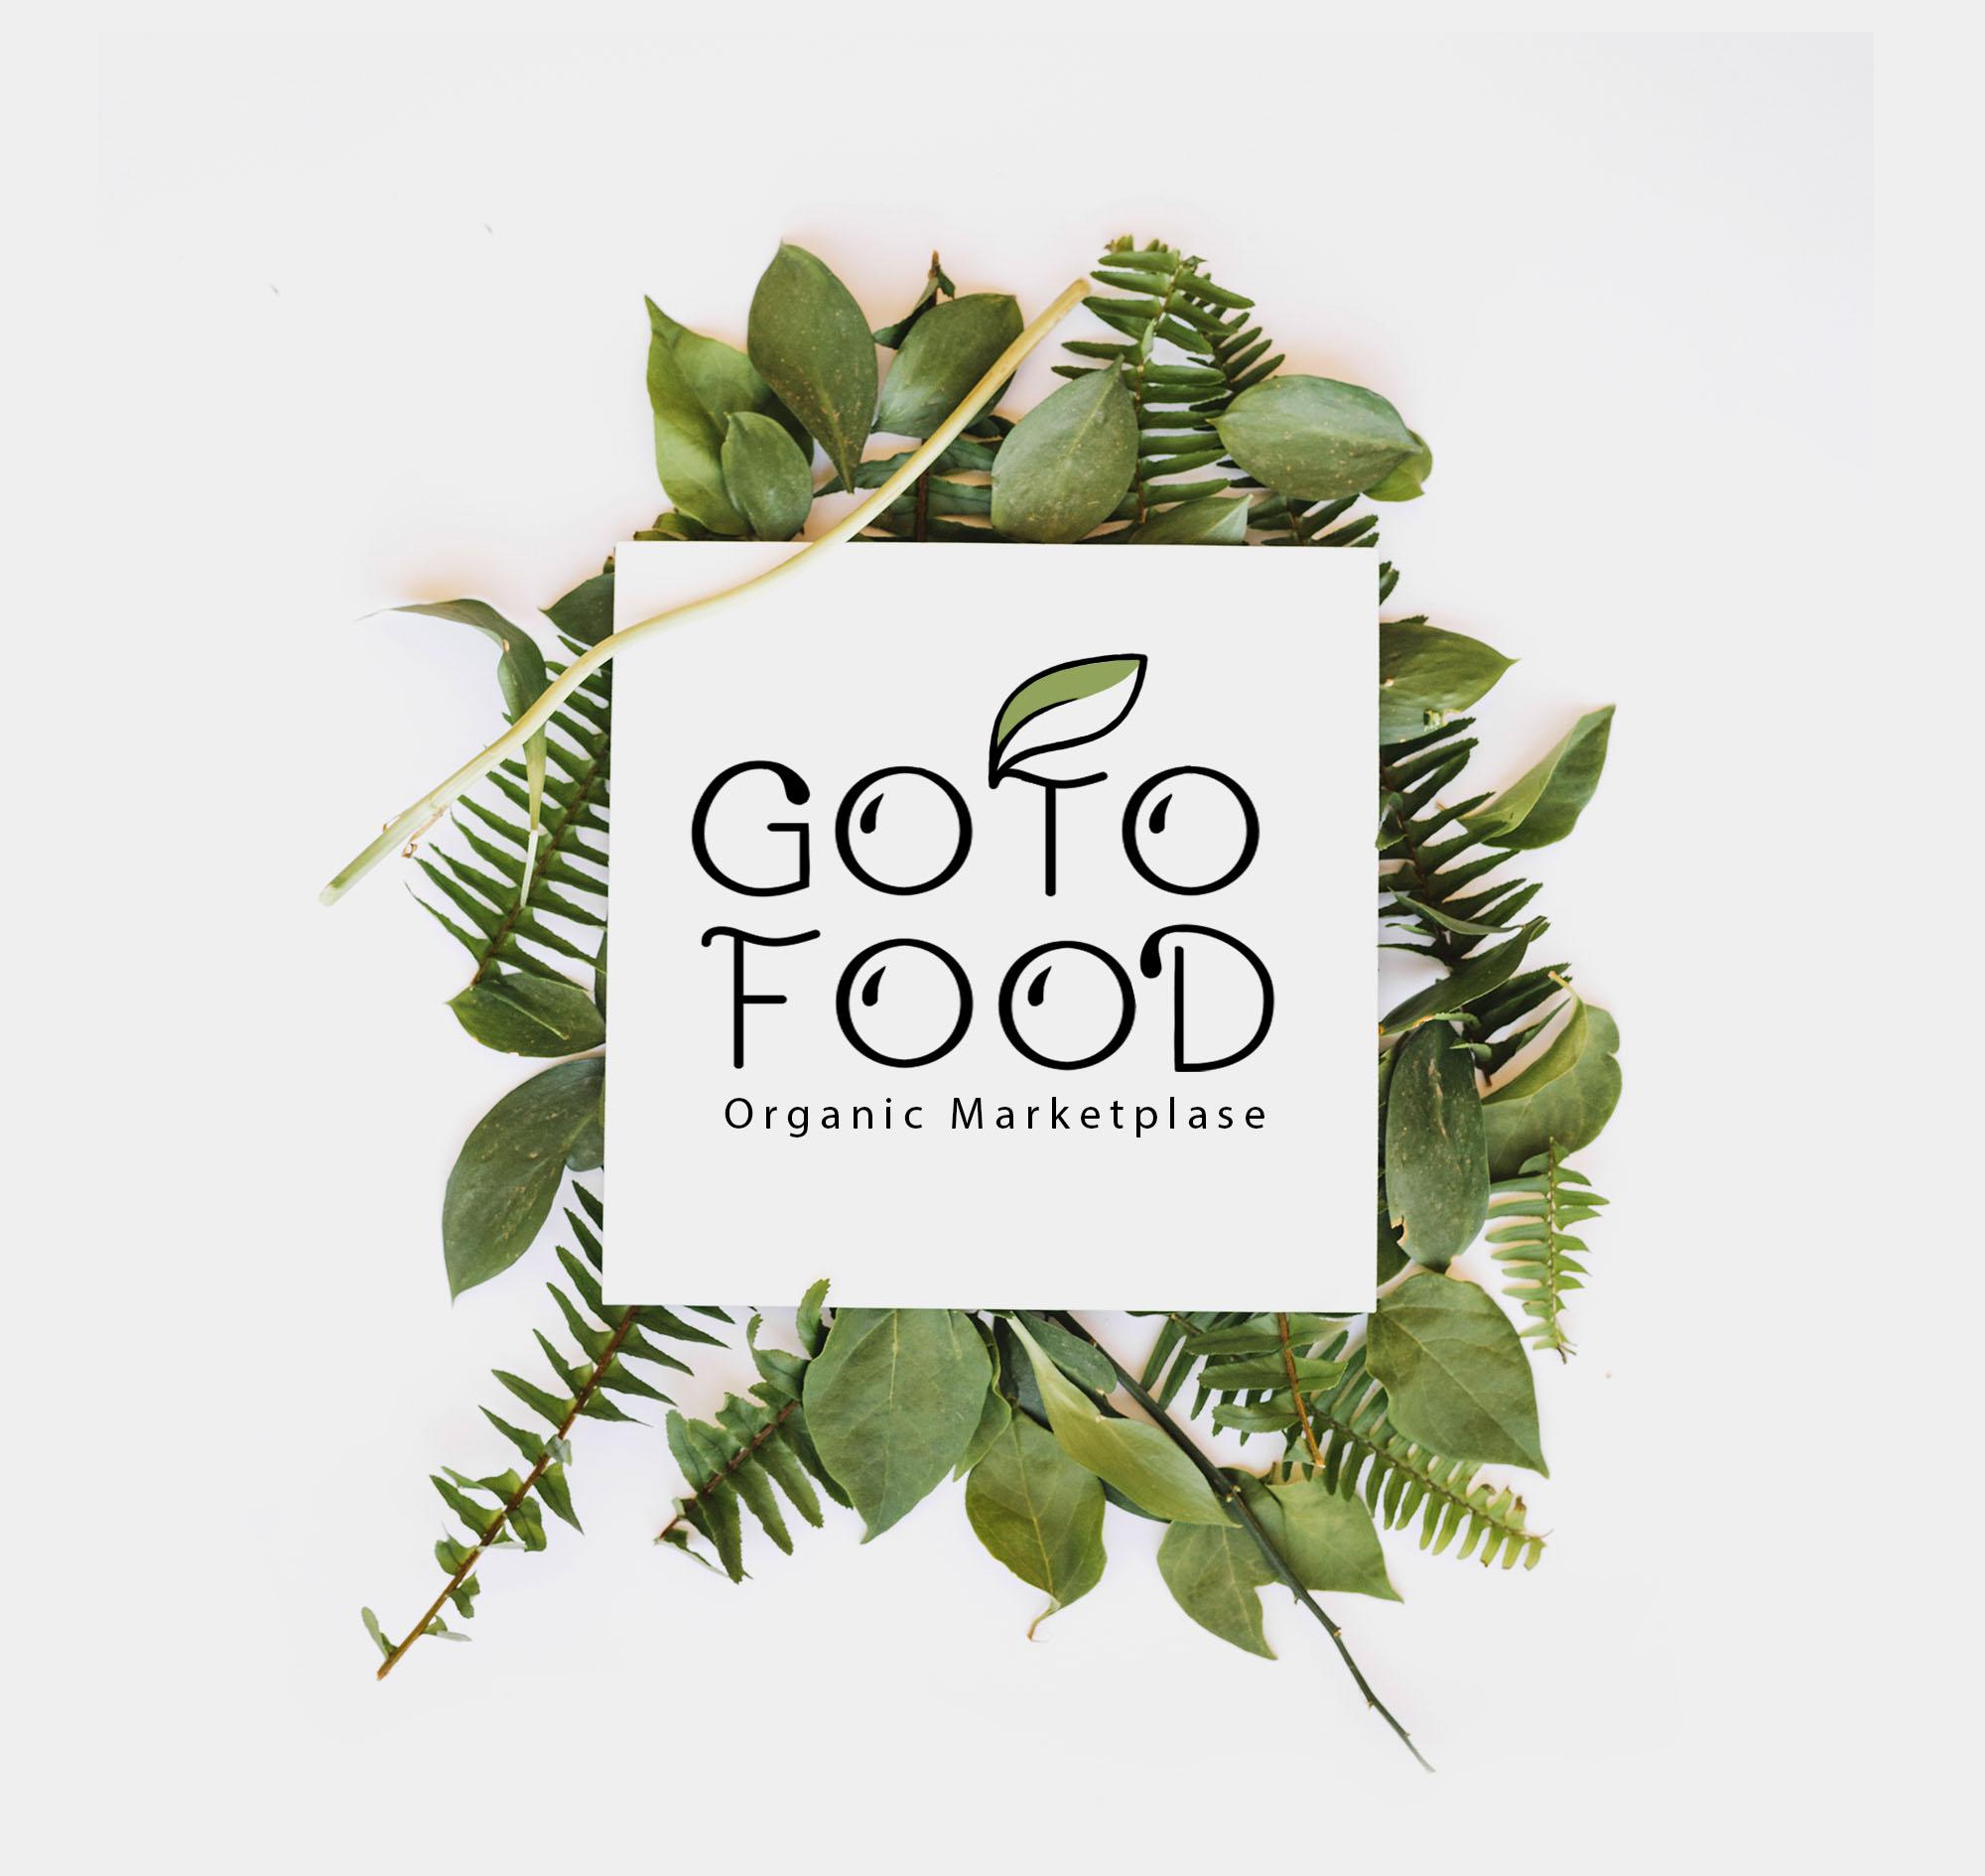 Логотип интернет-магазина здоровой еды фото f_0155cd3583f26e81.jpg